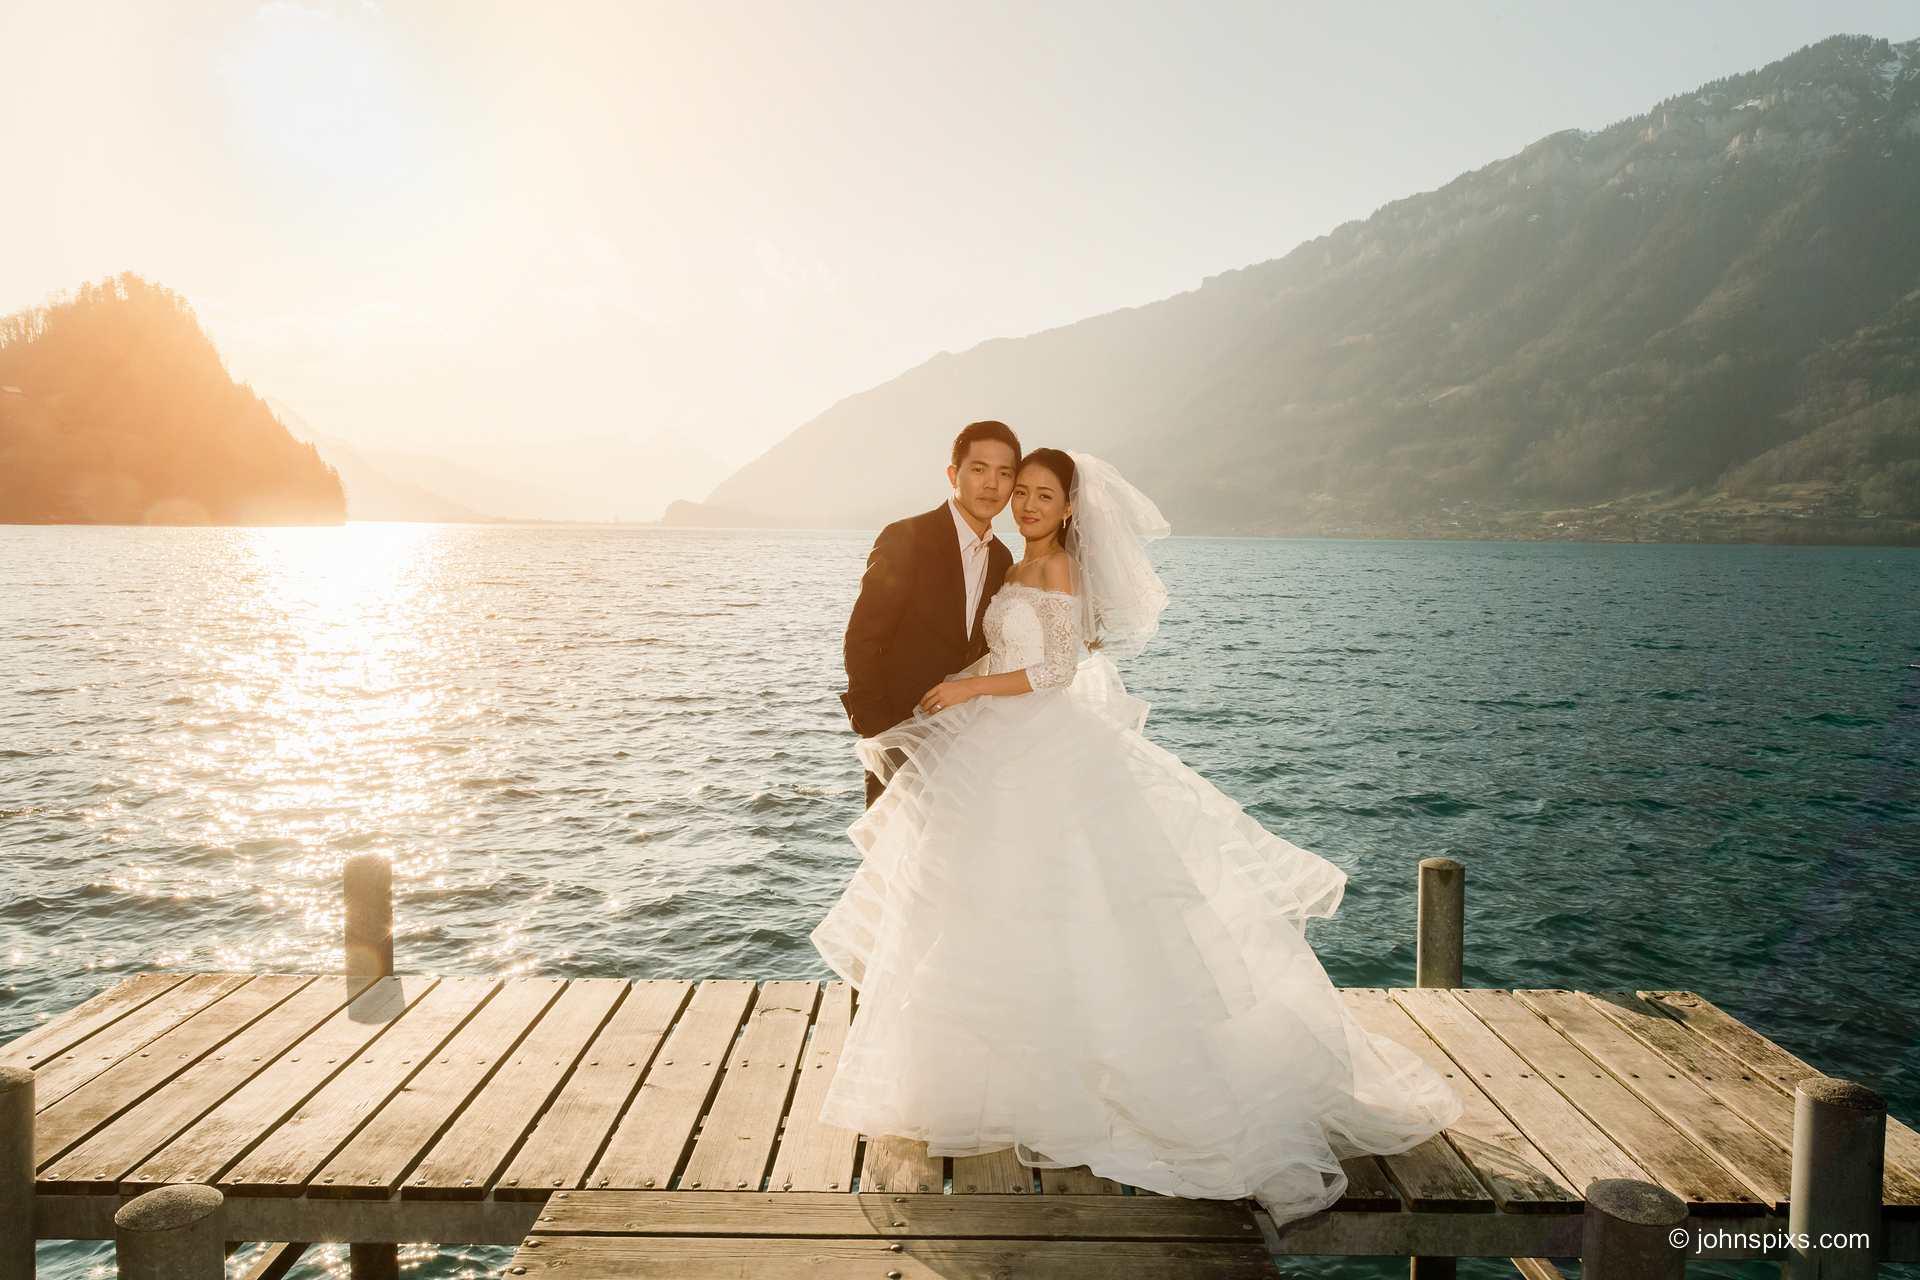 Before the wedding photo shoot by the lake near Interlaken, Switzerland